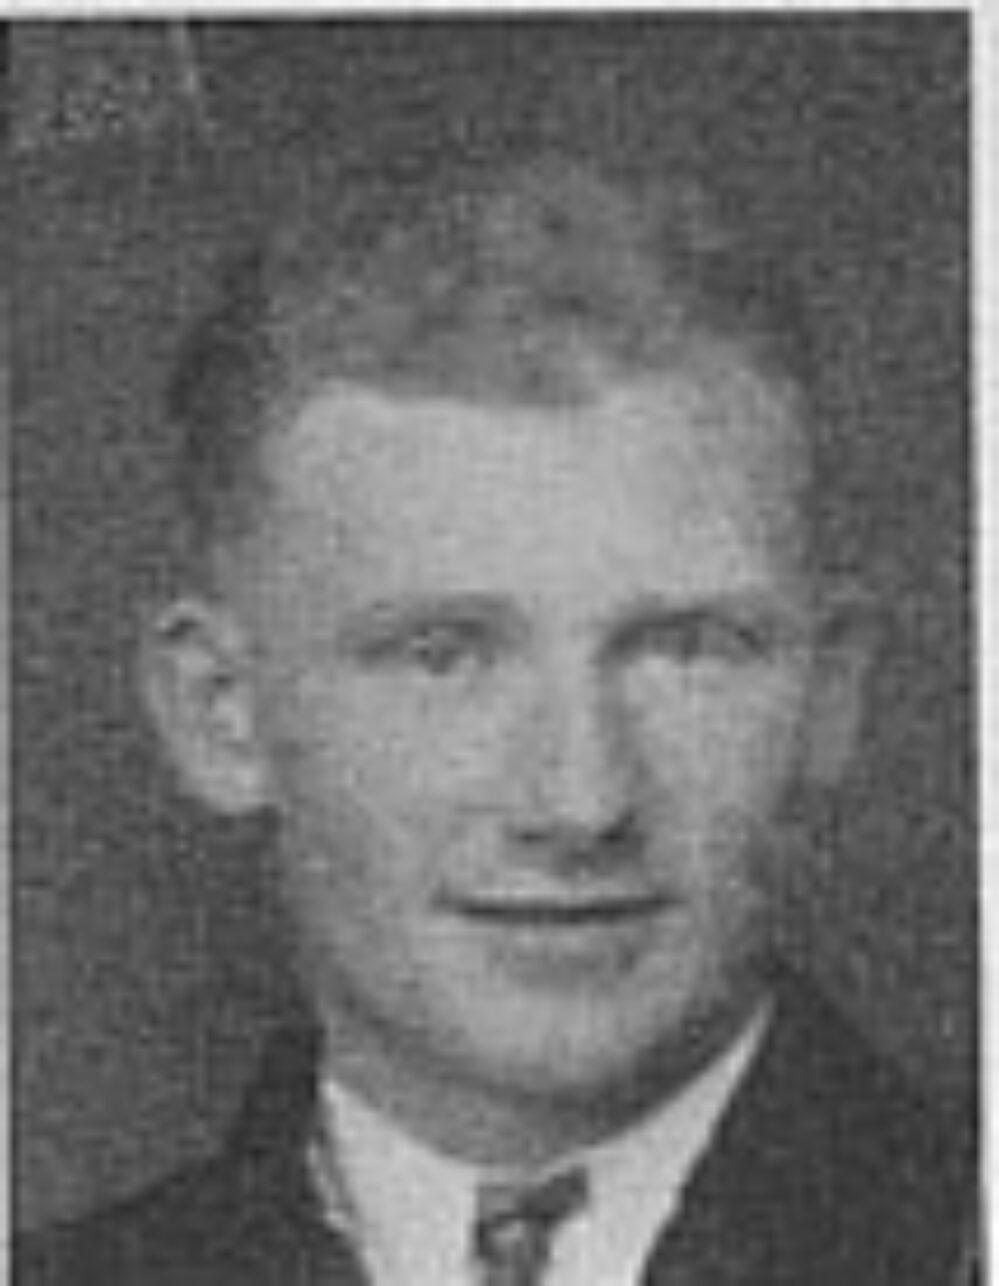 Johannes Enes